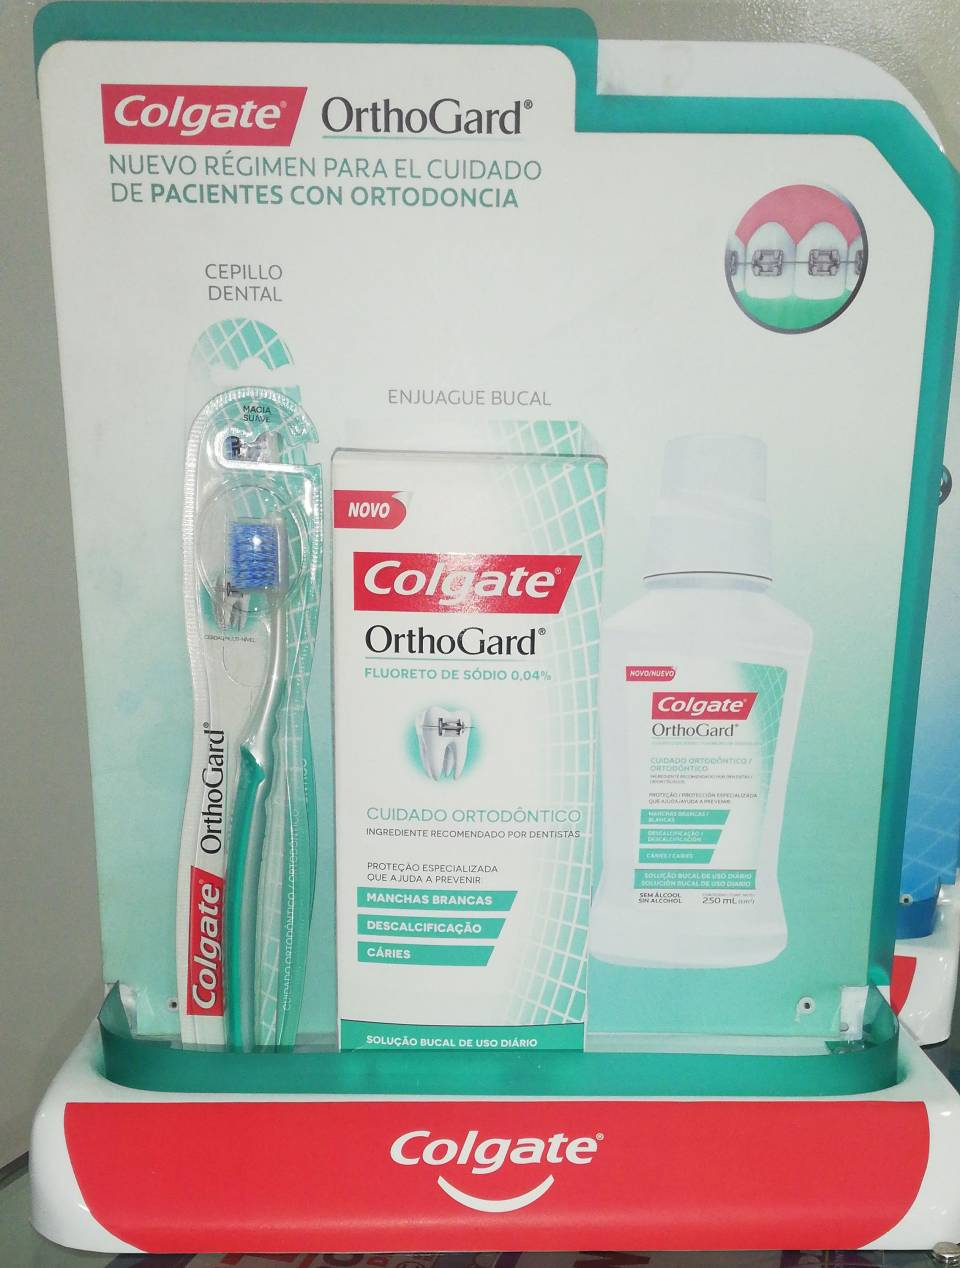 Kid Higiénico Para Ortodoncia Bogota | amarilla.co